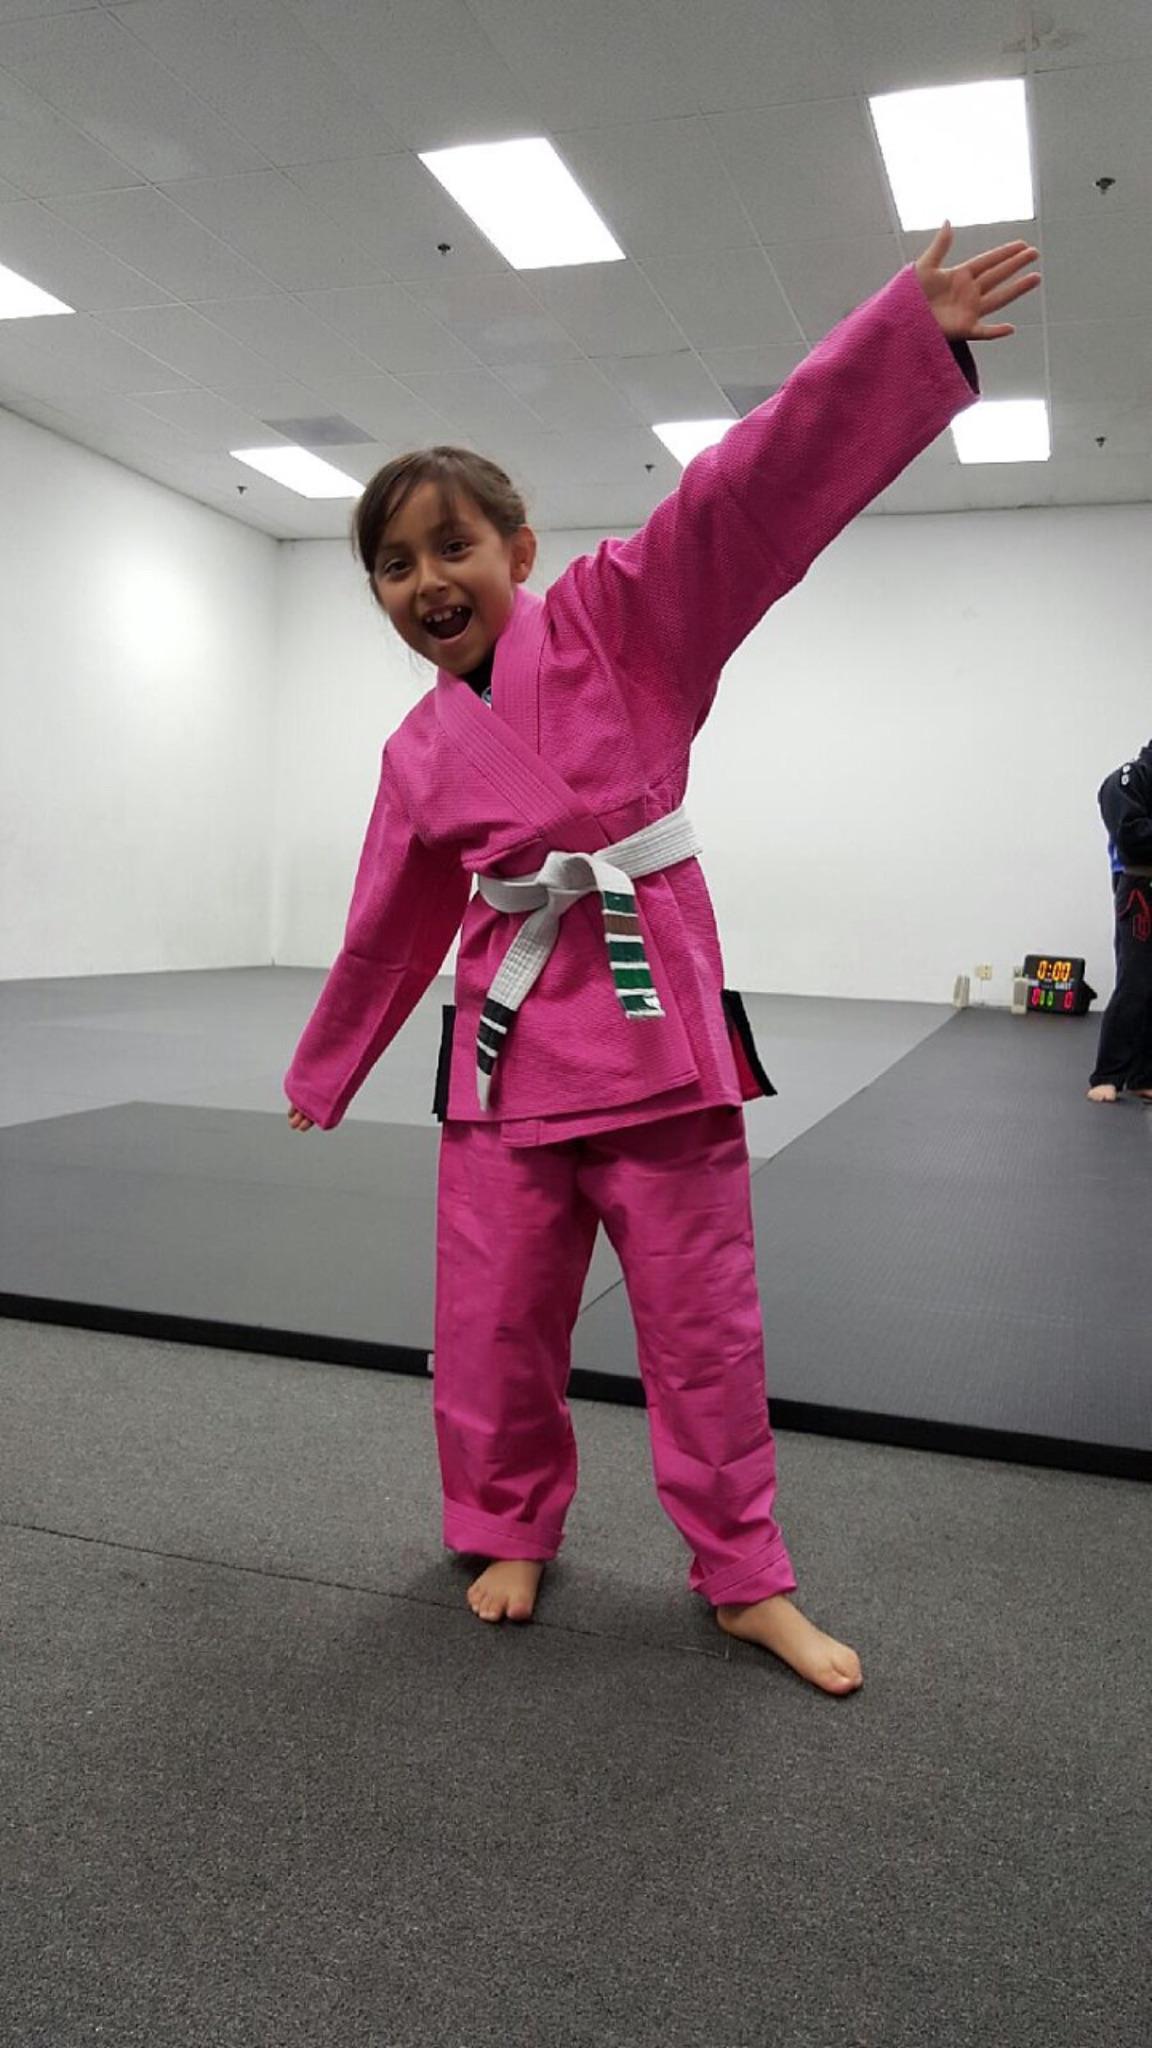 Dani when she started Jiu Jitsu at age 7